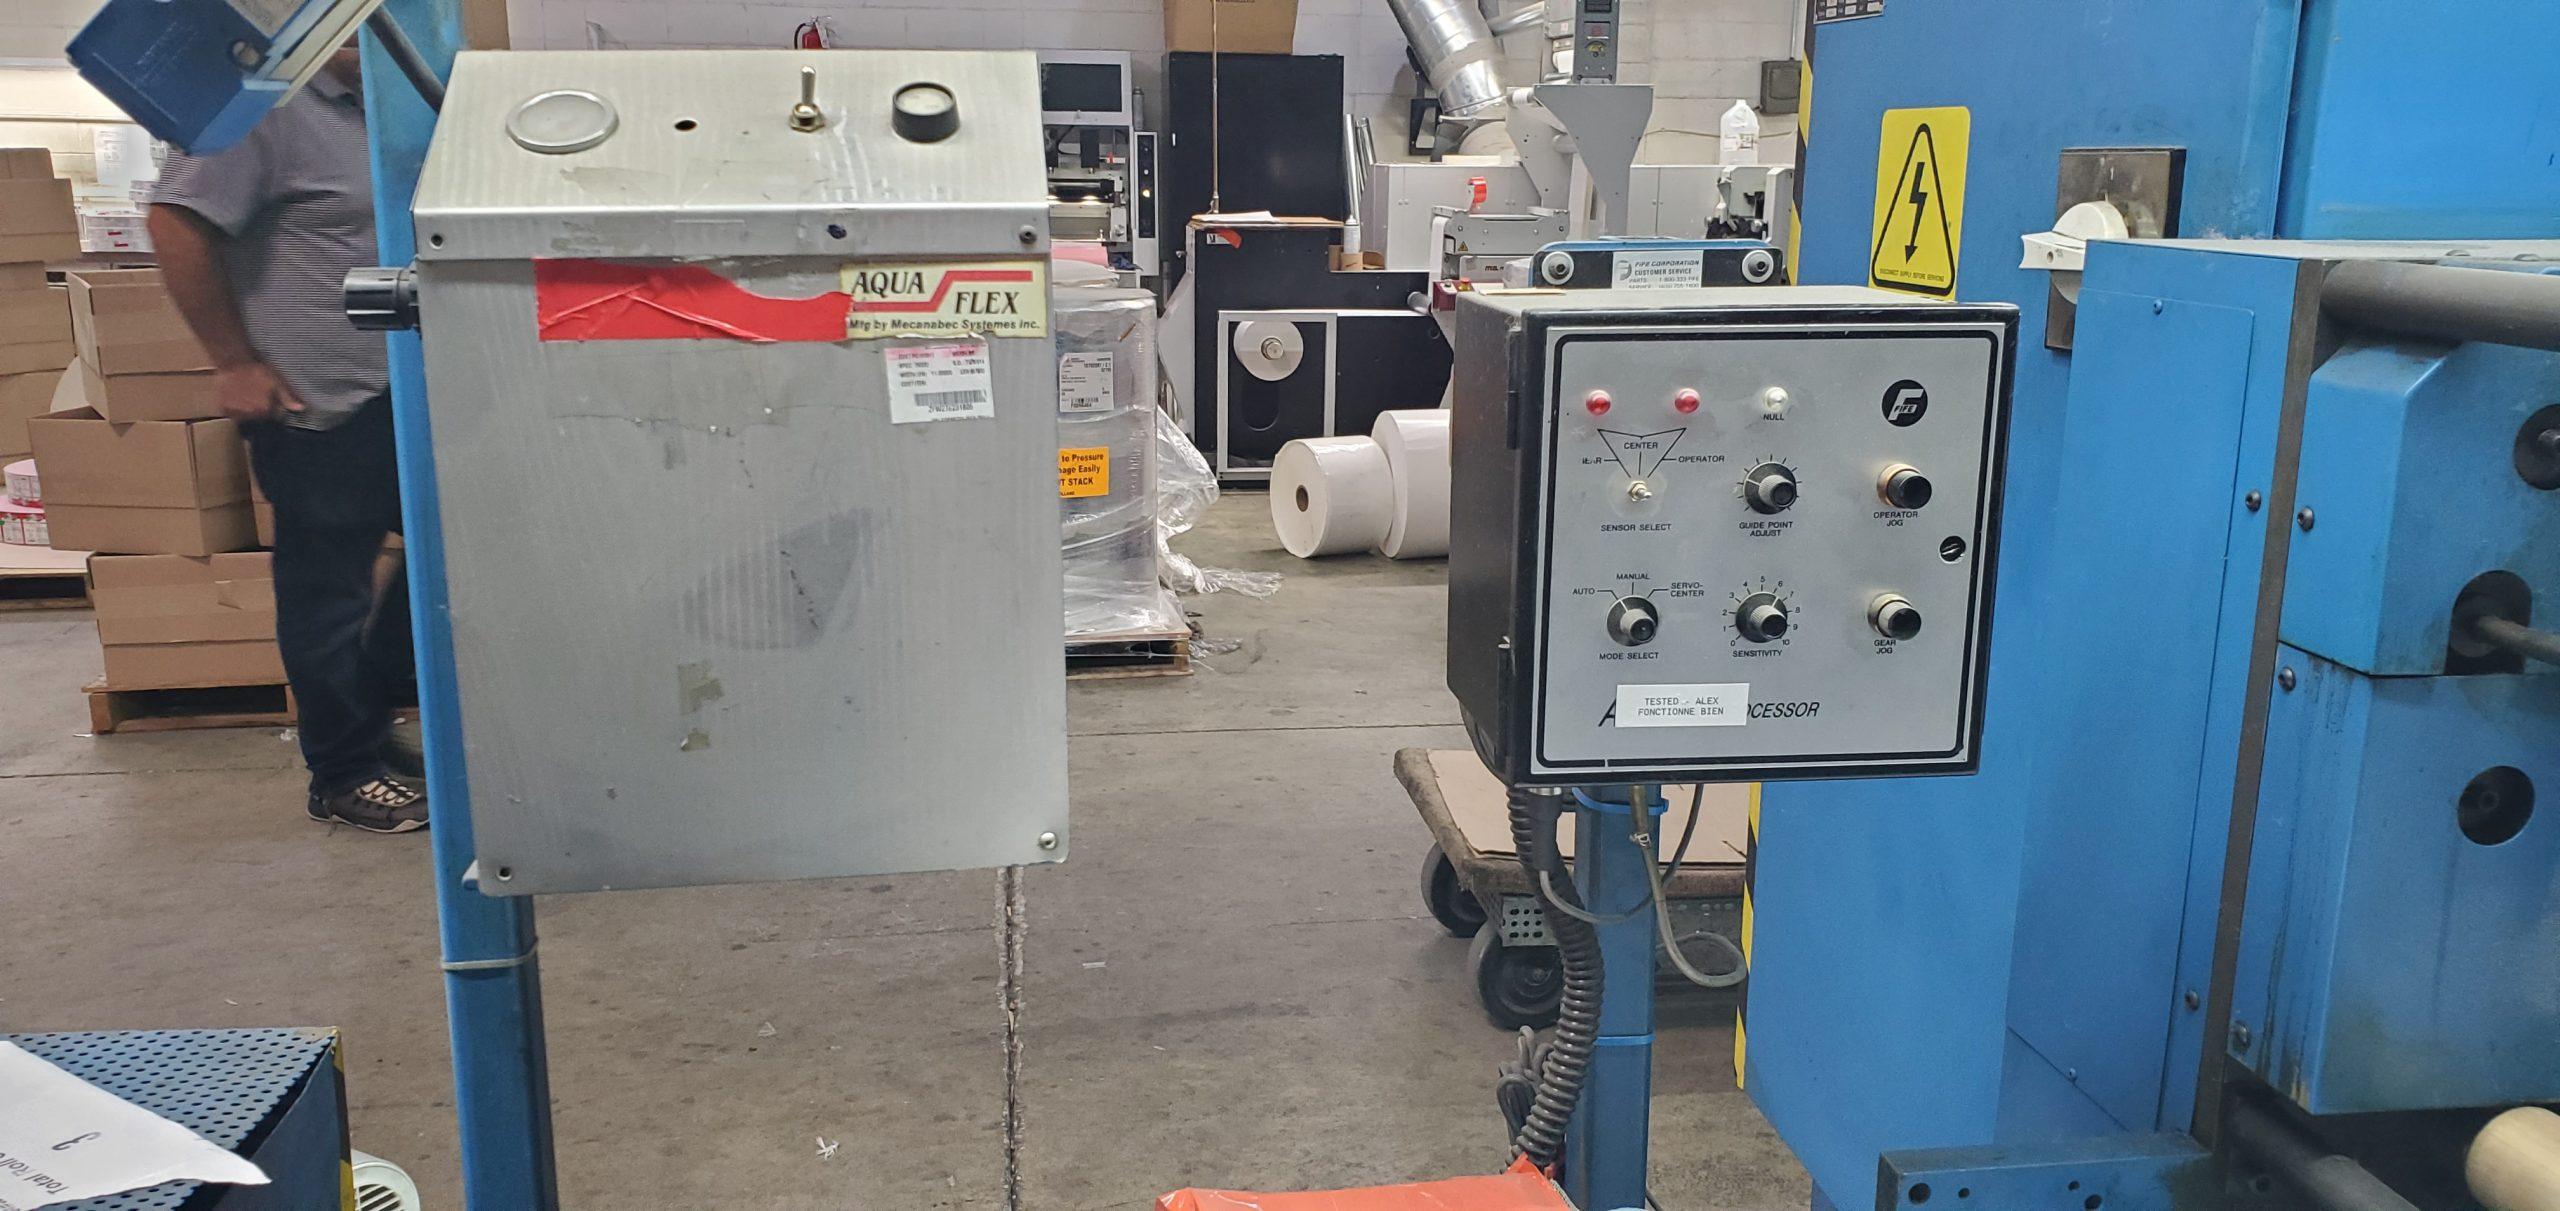 Aquaflex LWSP-1307 - Used Flexo Printing Presses and Used Flexographic Equipment-11